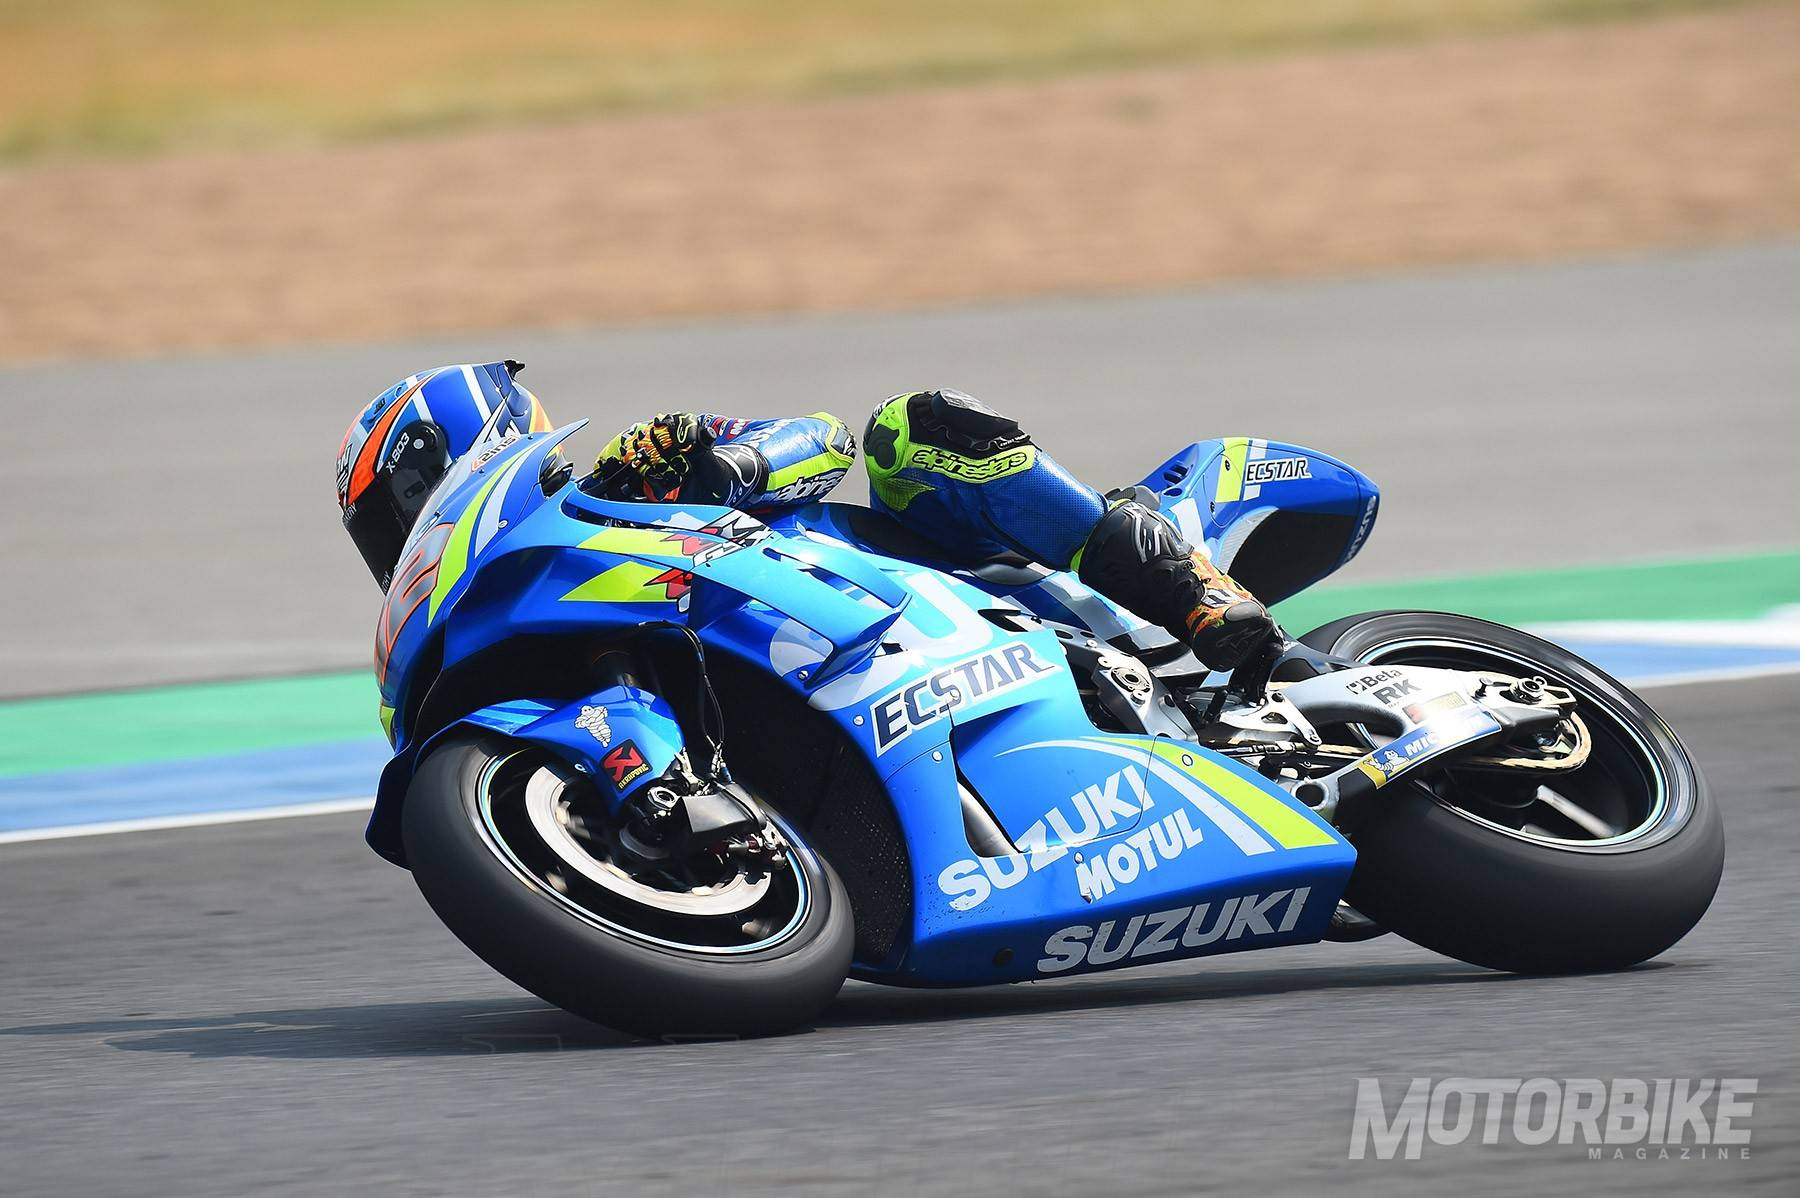 App Noticias Motogp | MotoGP 2017 Info, Video, Points Table